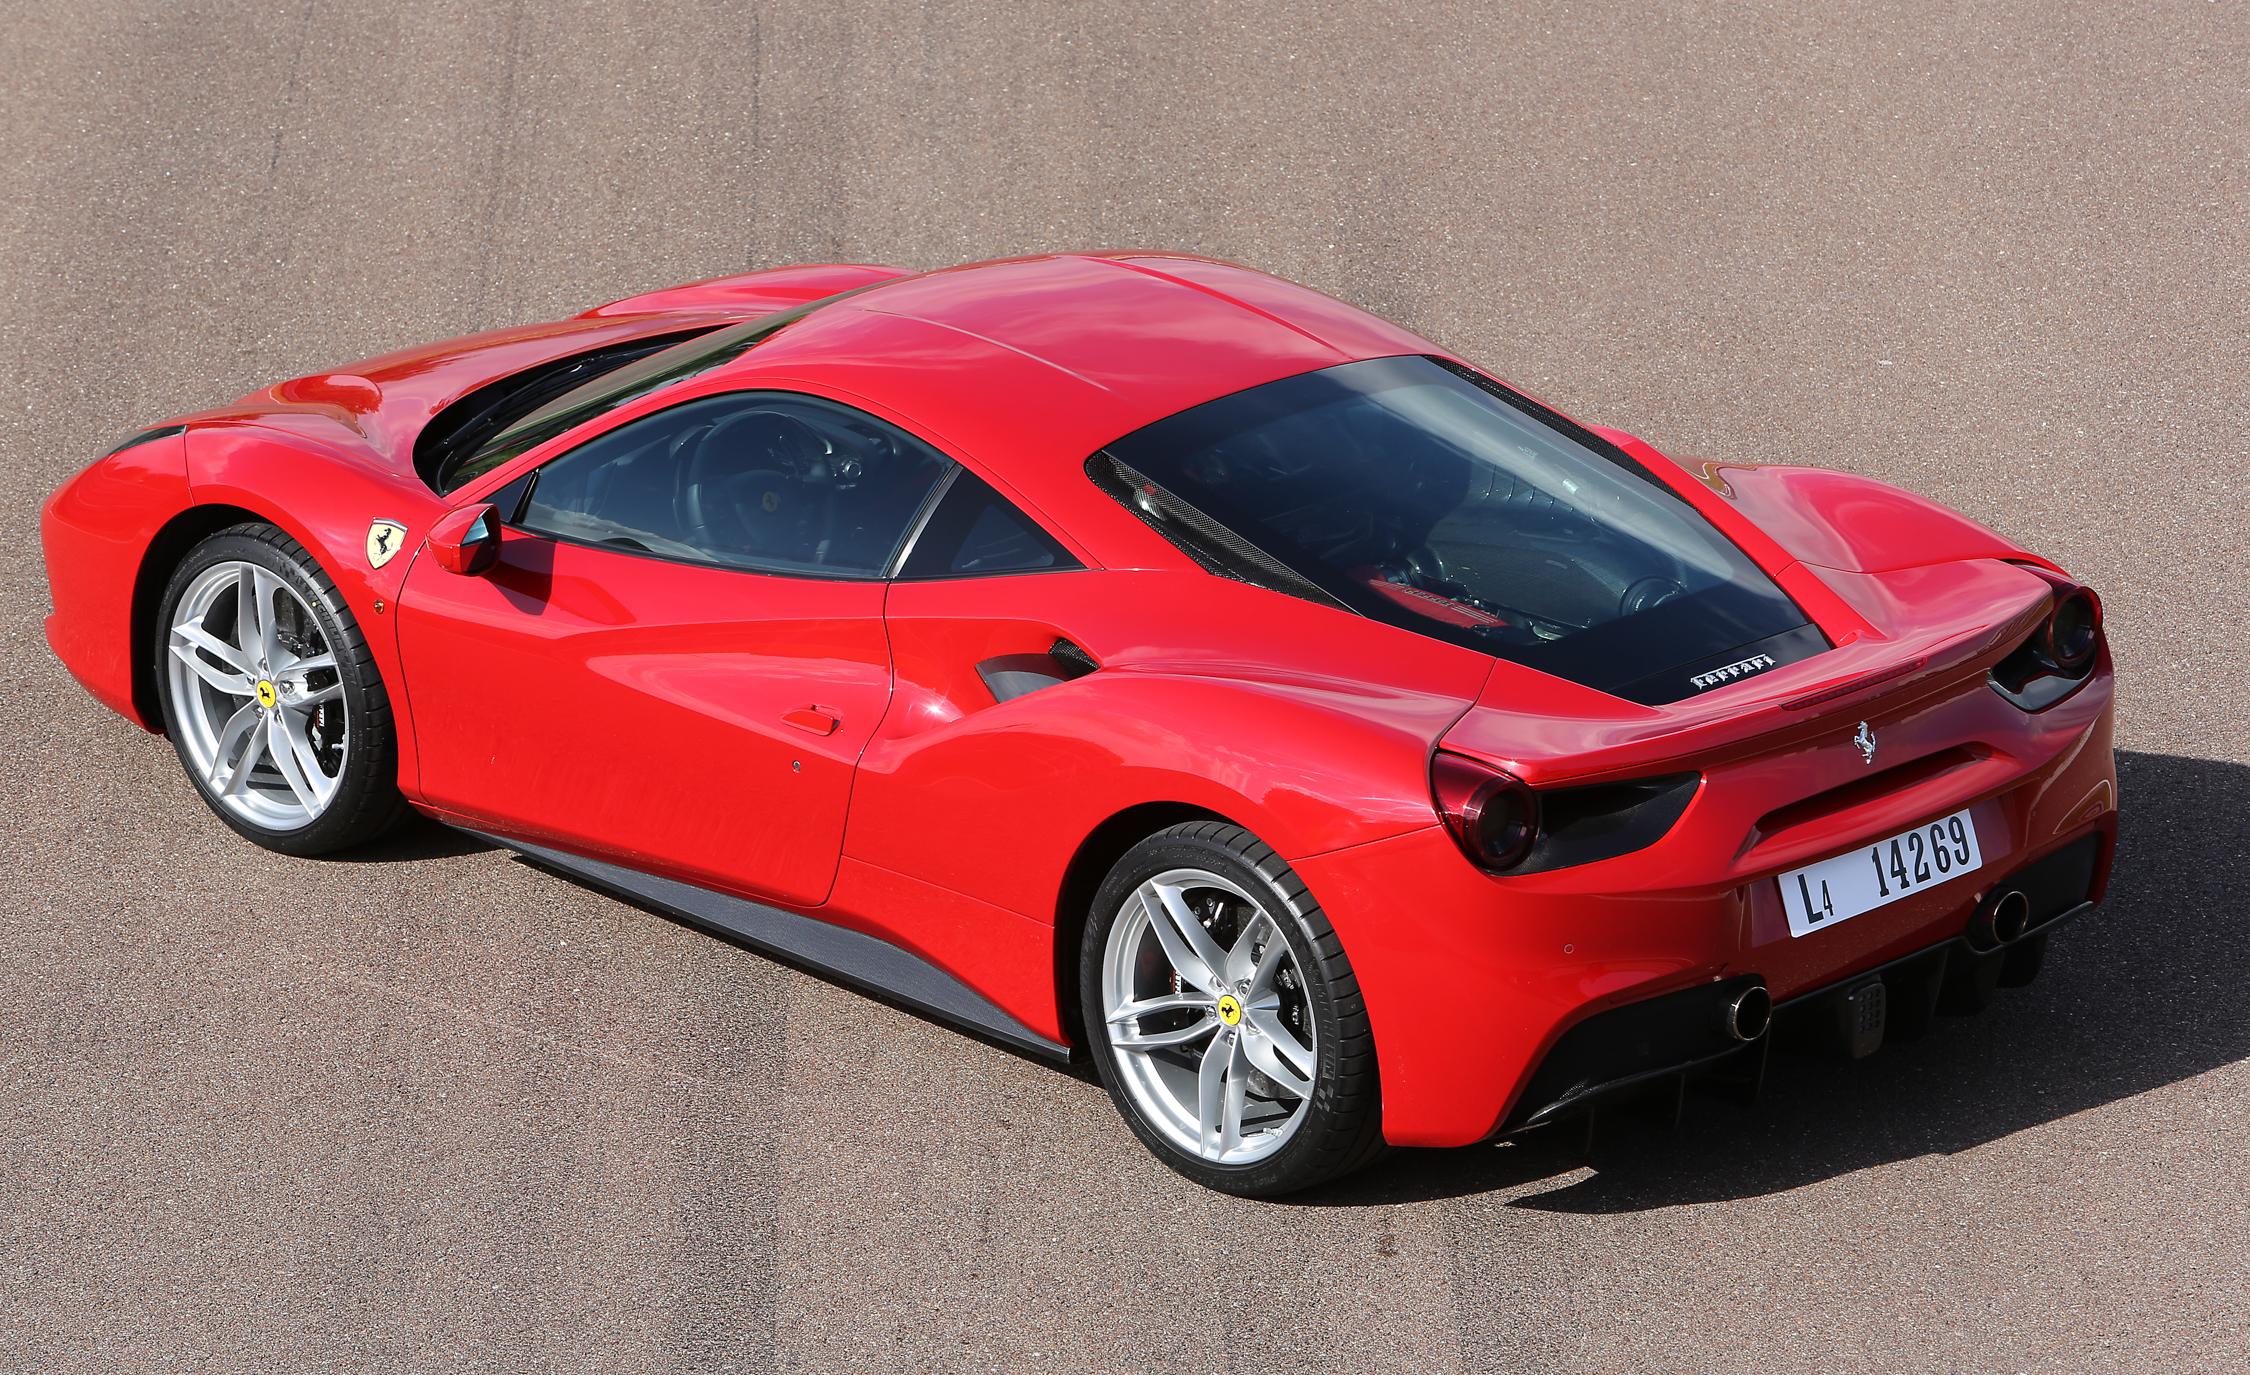 2016 Ferrari 488GTB Exterior Full Side and Rear